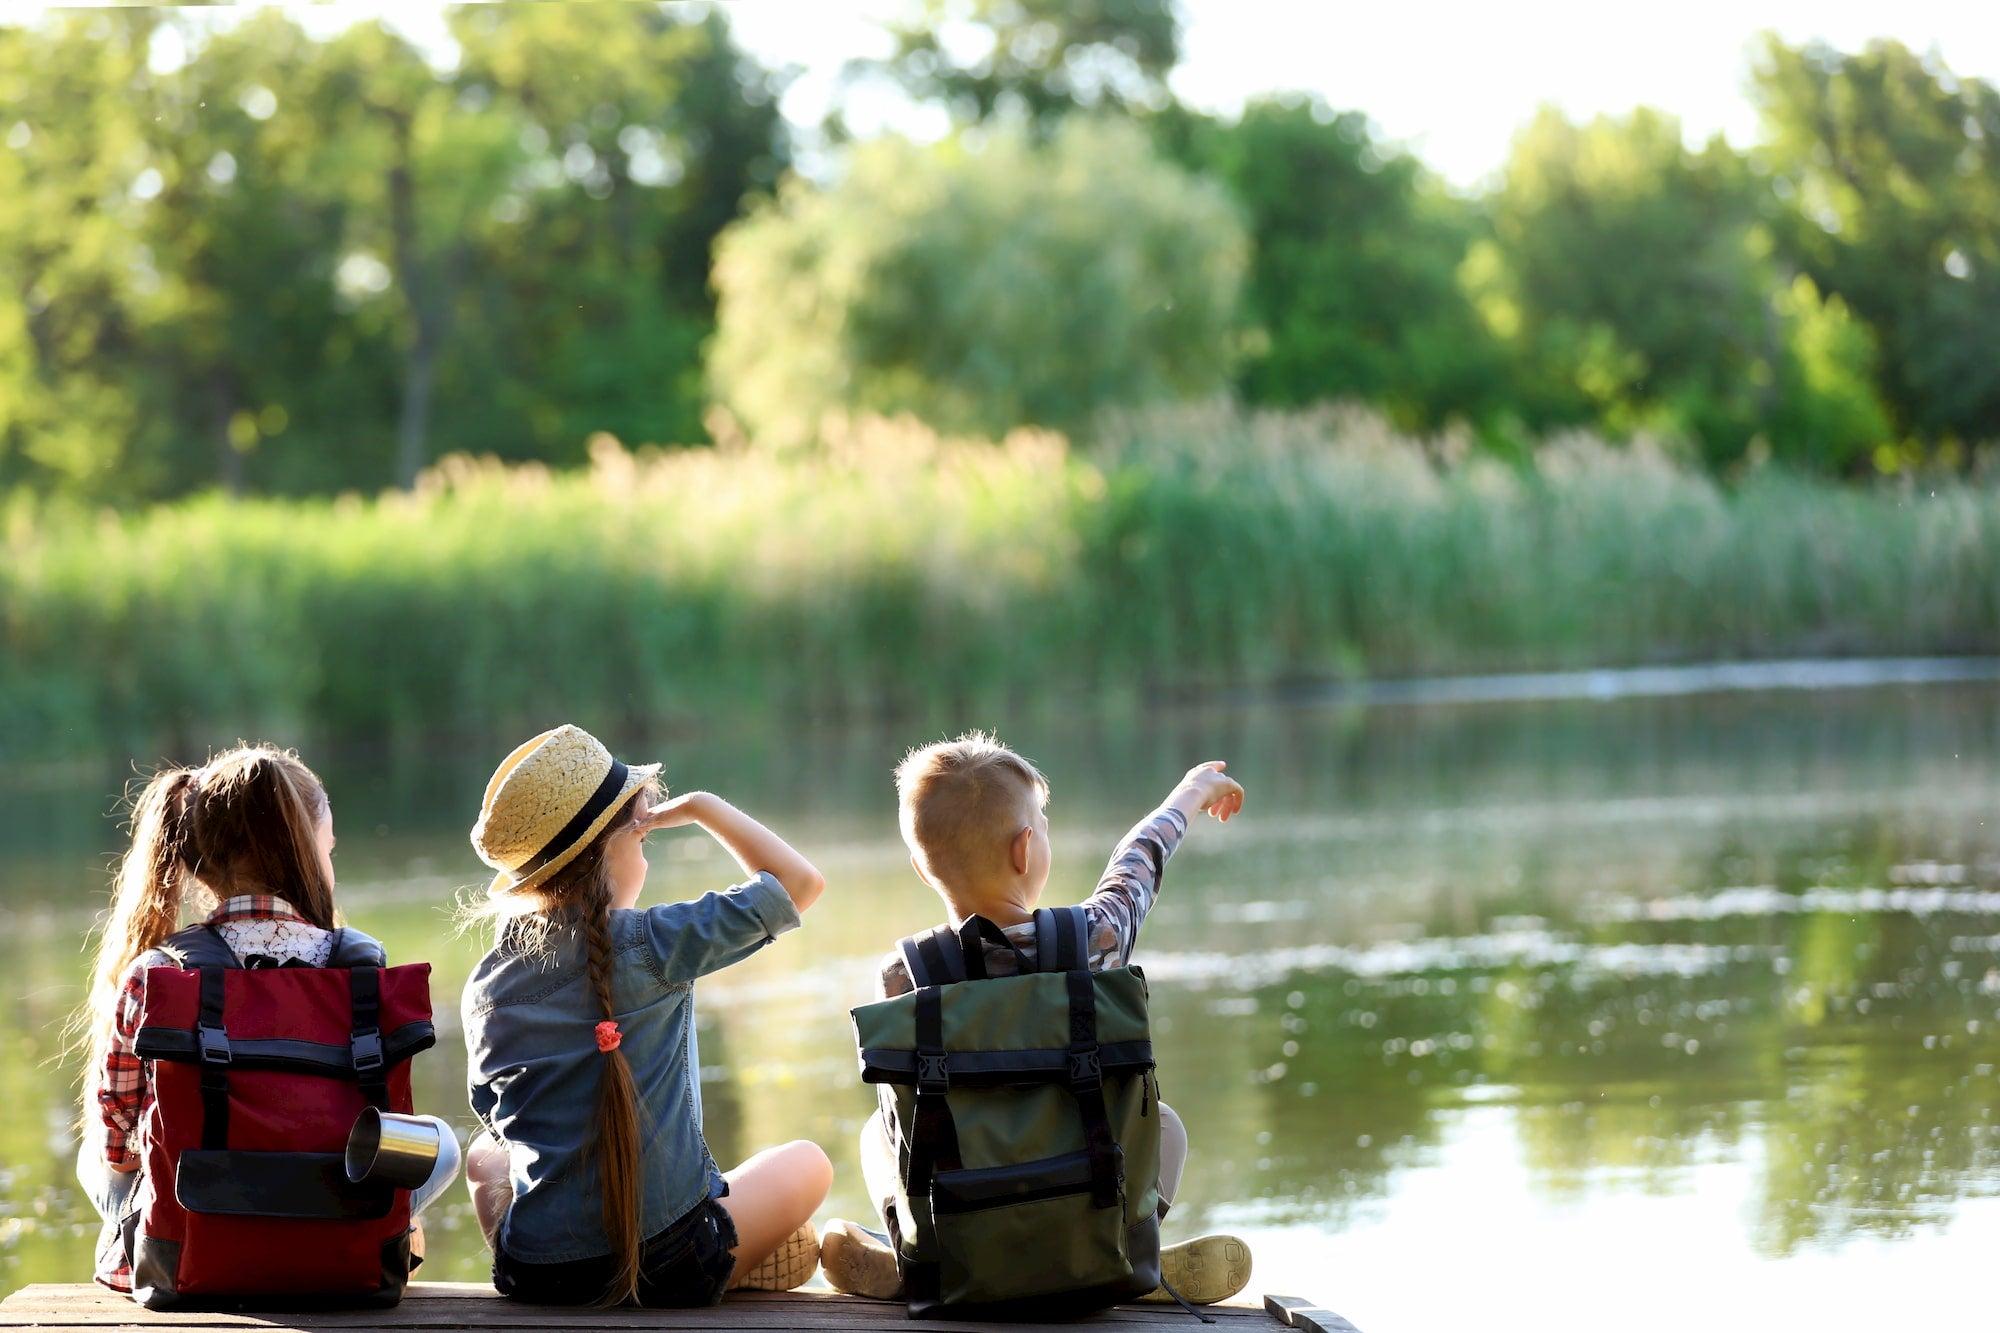 three kids overlooking a river wearing outdoor gear